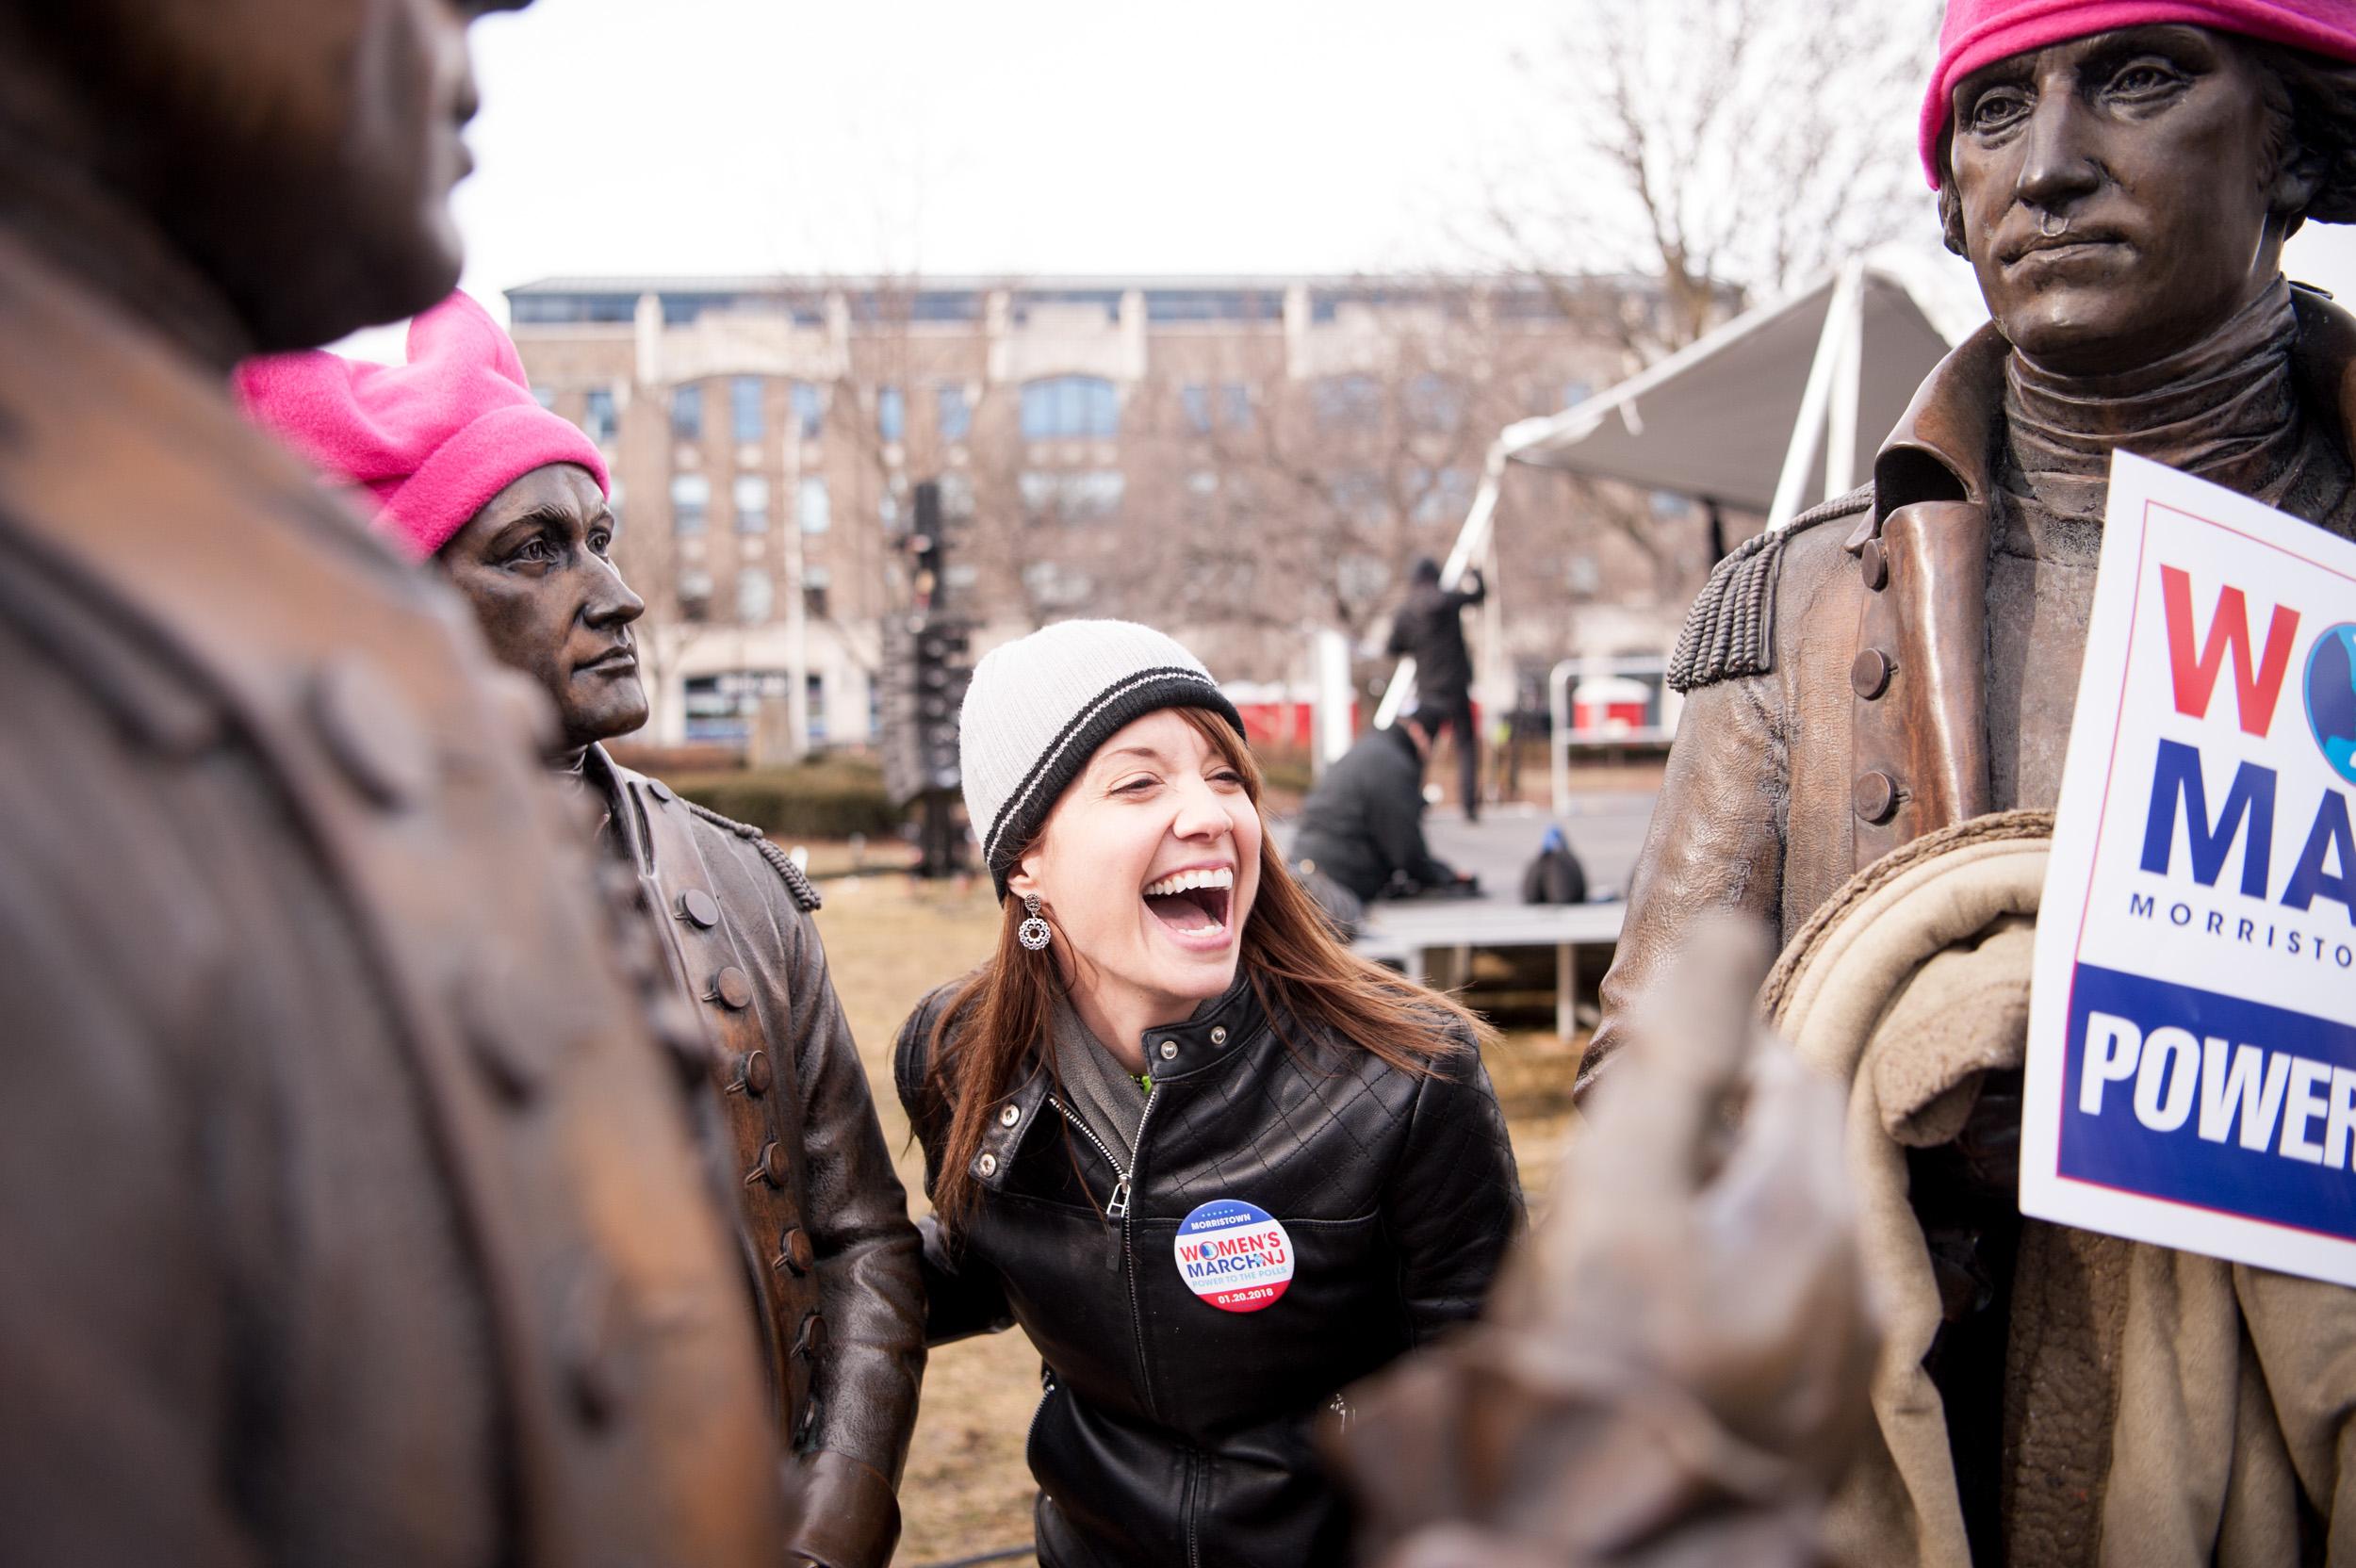 Elizabeth Meyer, organizer of the Women's March on NJ